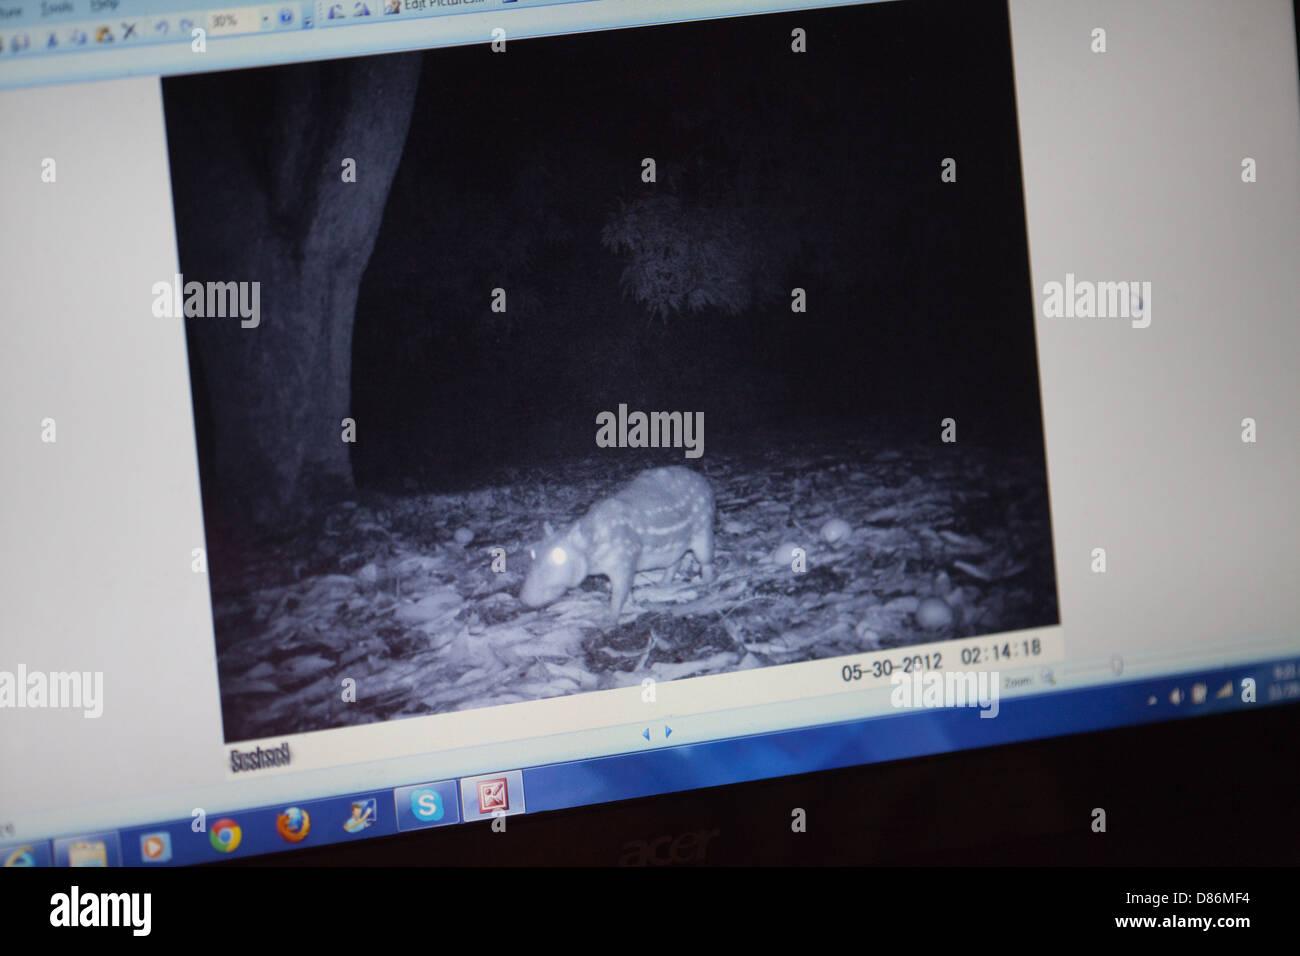 Camera trap image of a Paca (Cuniculus paca), viewed on a PC monitor screen. Recorded on the Karanambu Ranch Guyana. - Stock Image